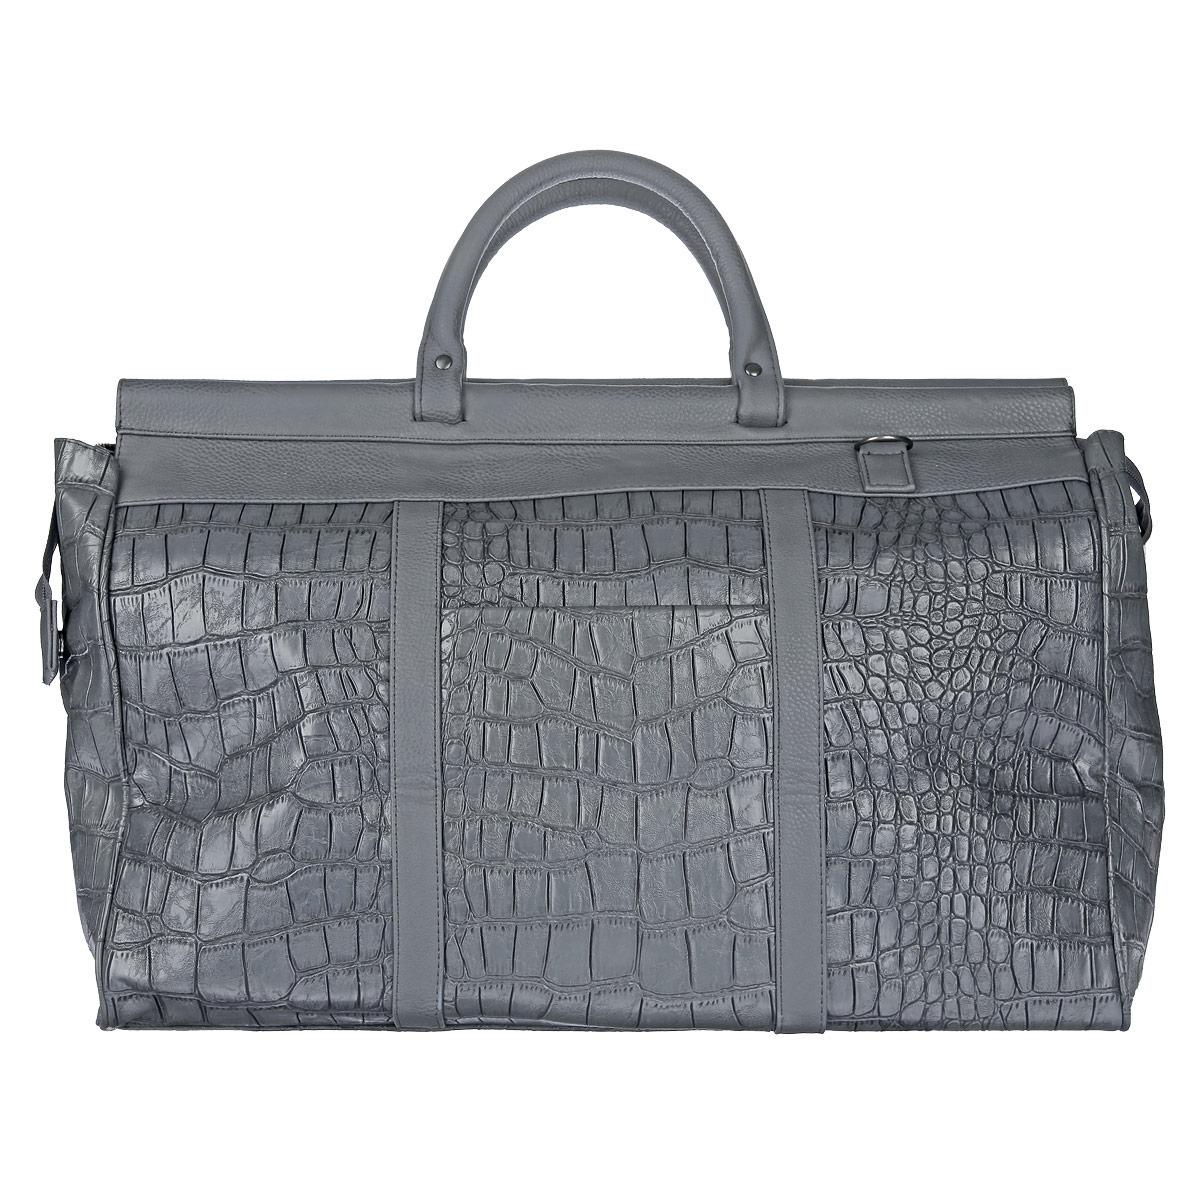 Сумка дорожная Antan Крокодил, цвет: темно-серый. 2-197 сумка дорожная antan собачки цвет темно синий 2 4m